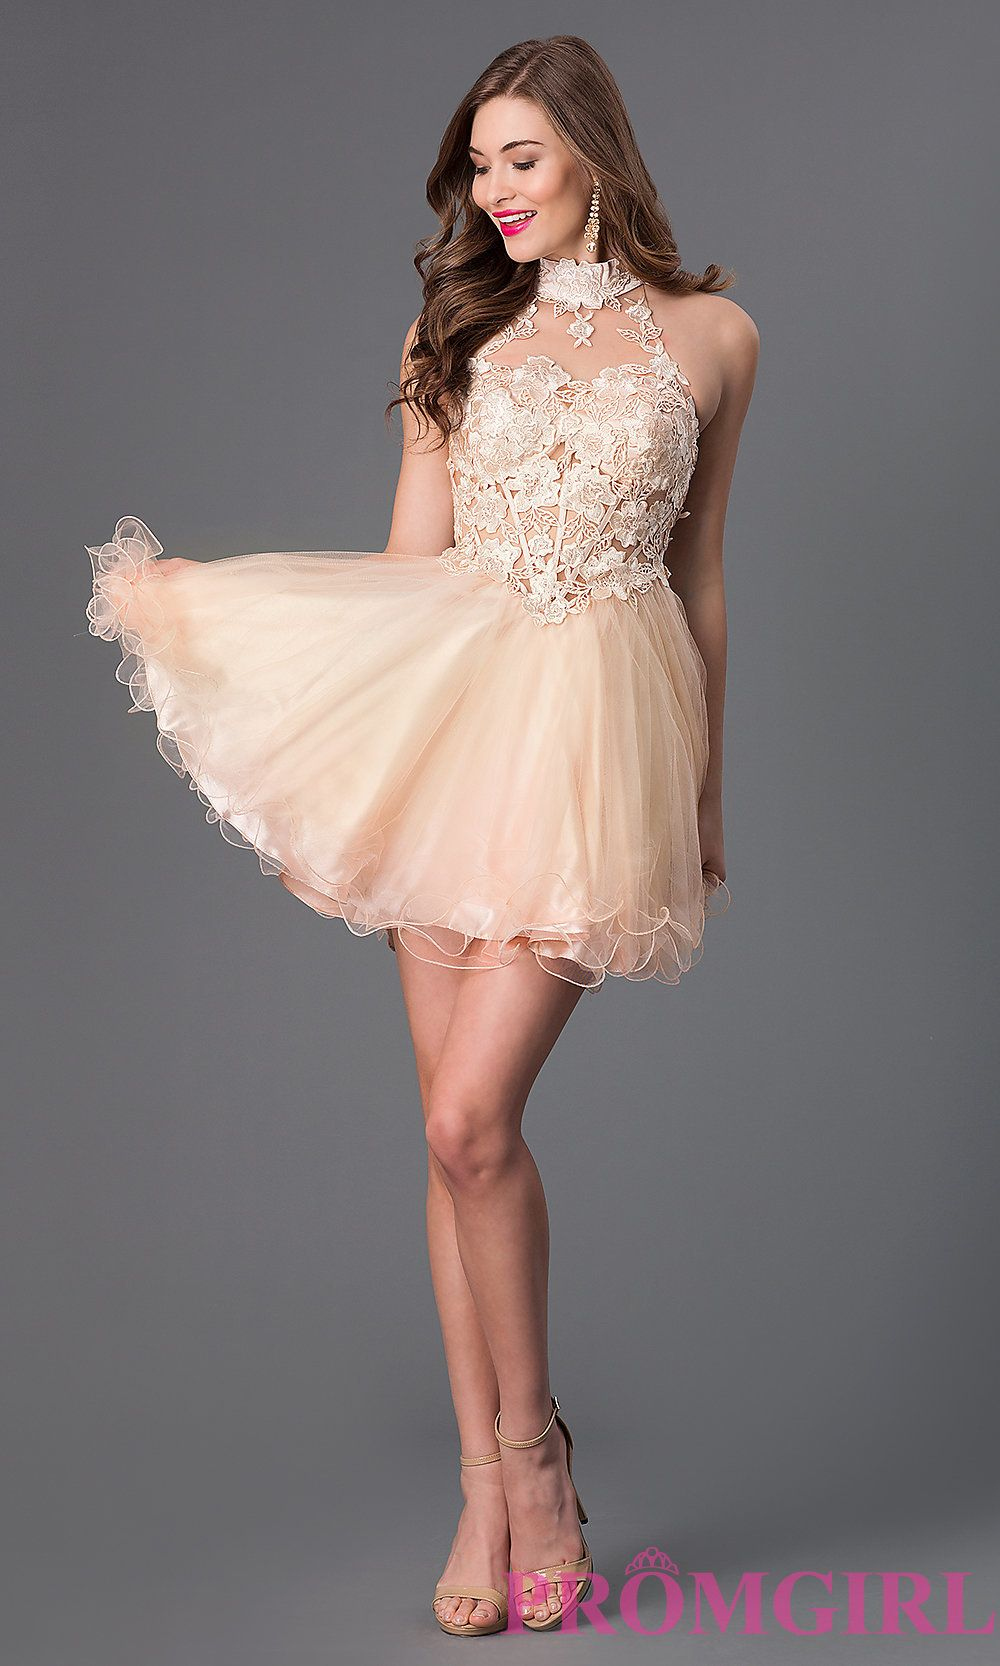 Short prom dress style dj detail image grace elizabeth